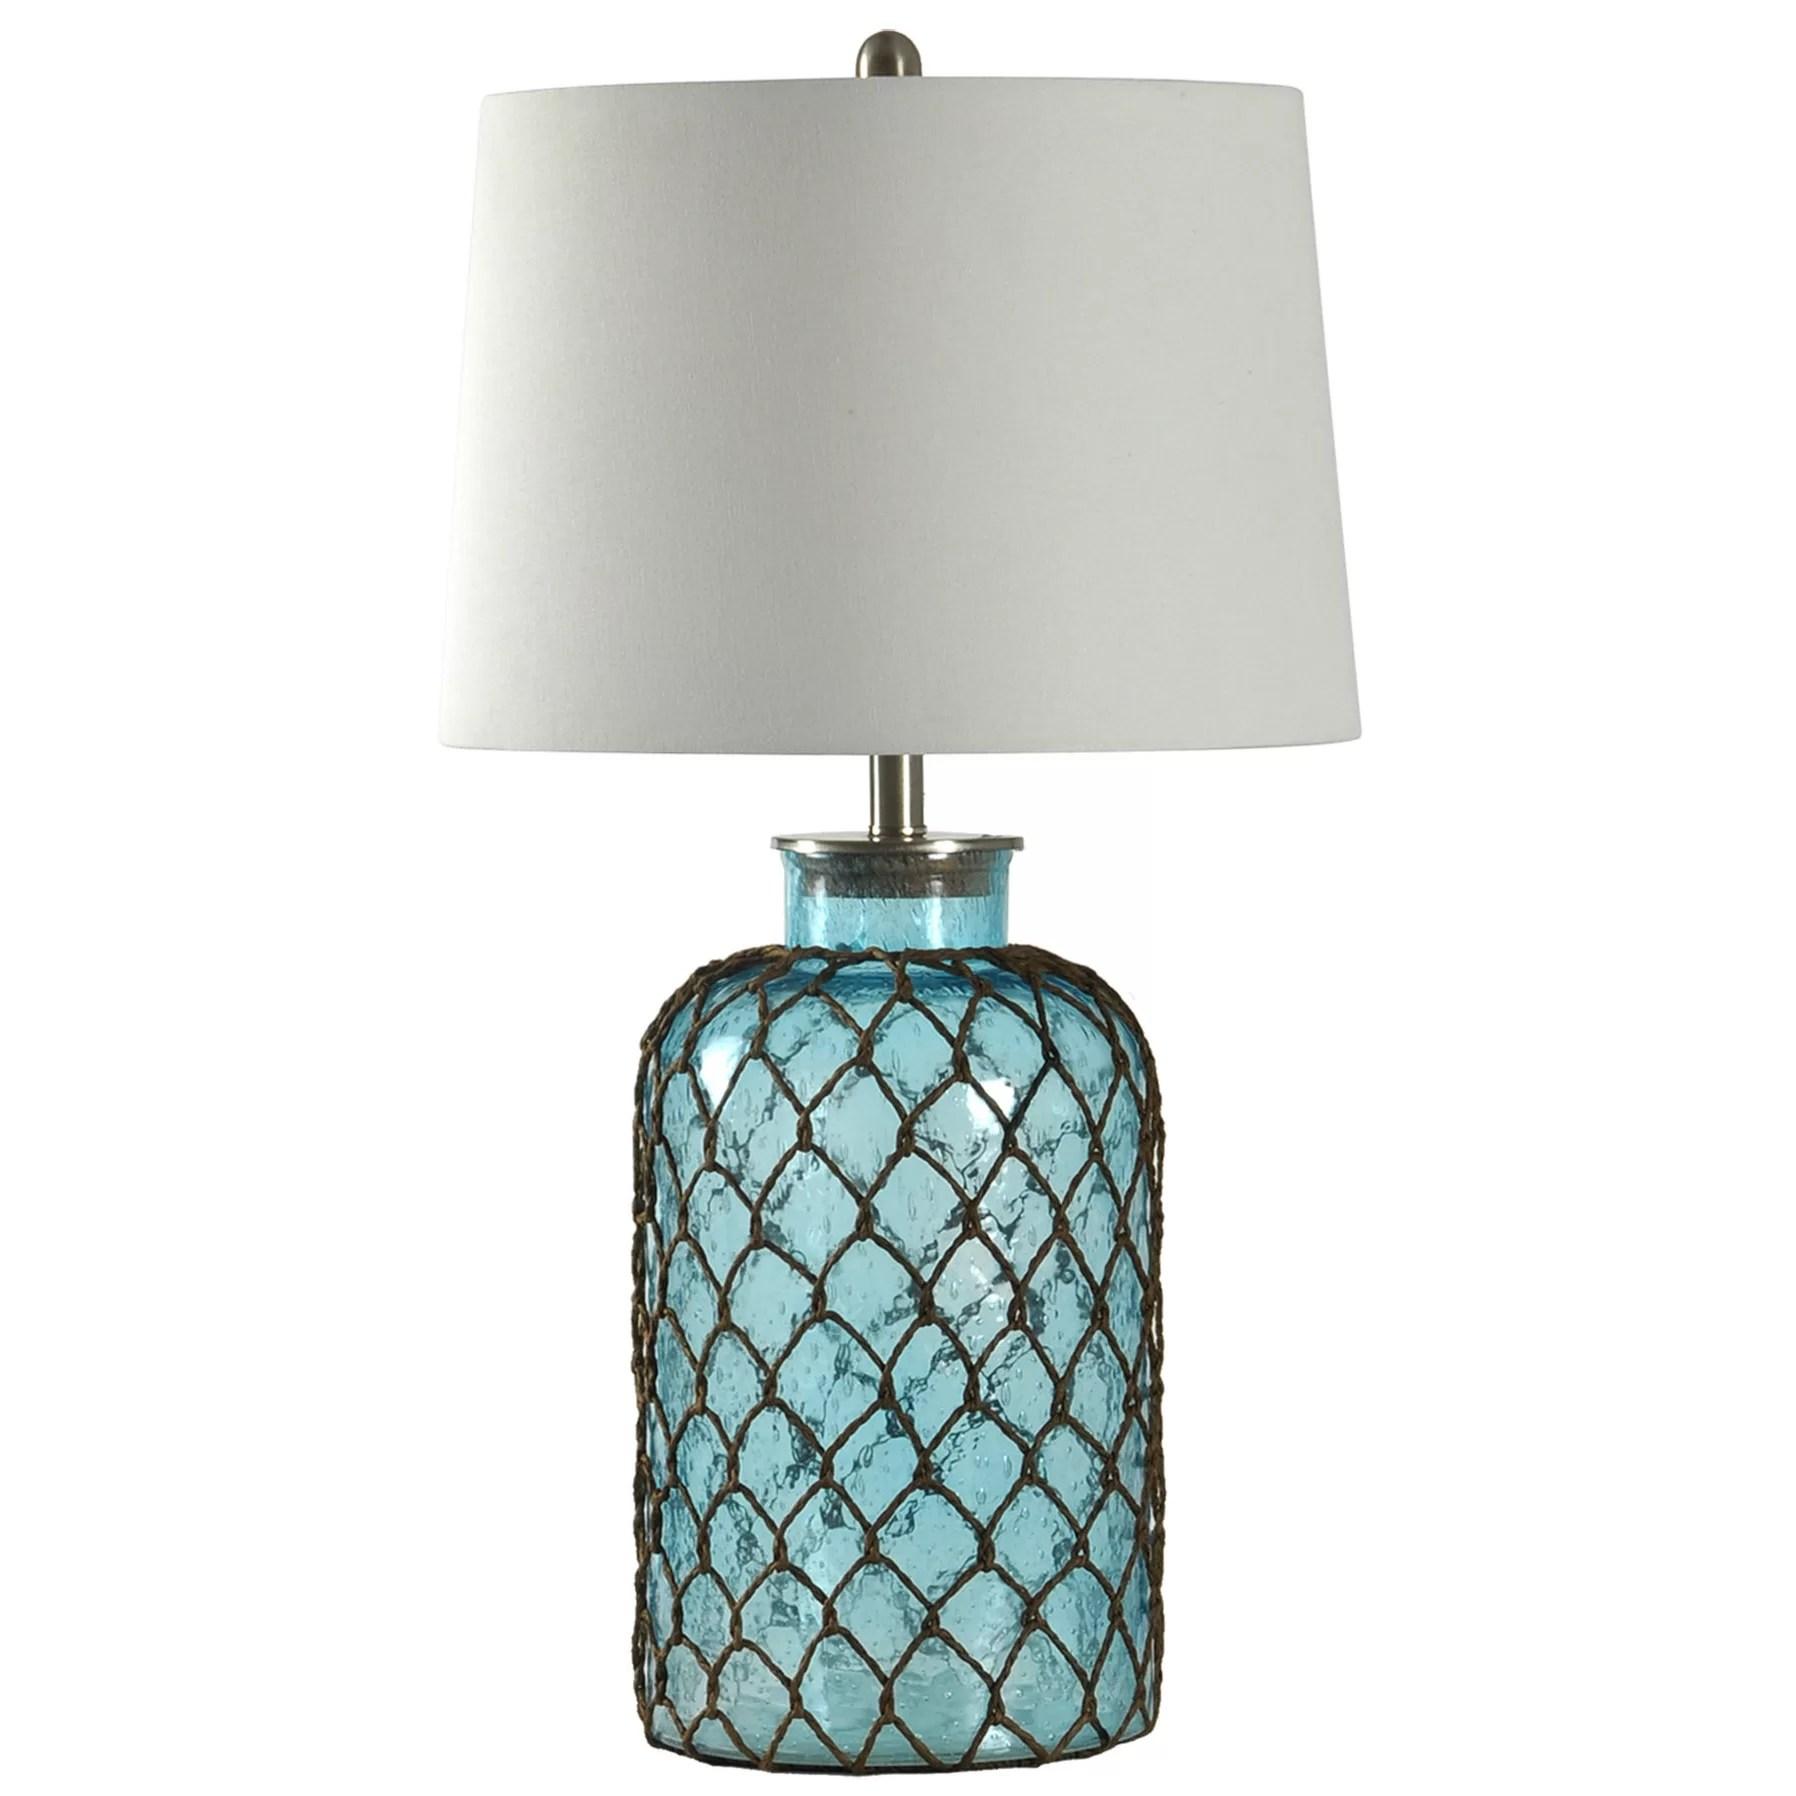 "Breakwater Bay Belvidere Nautical Net 30"" Table Lamp"